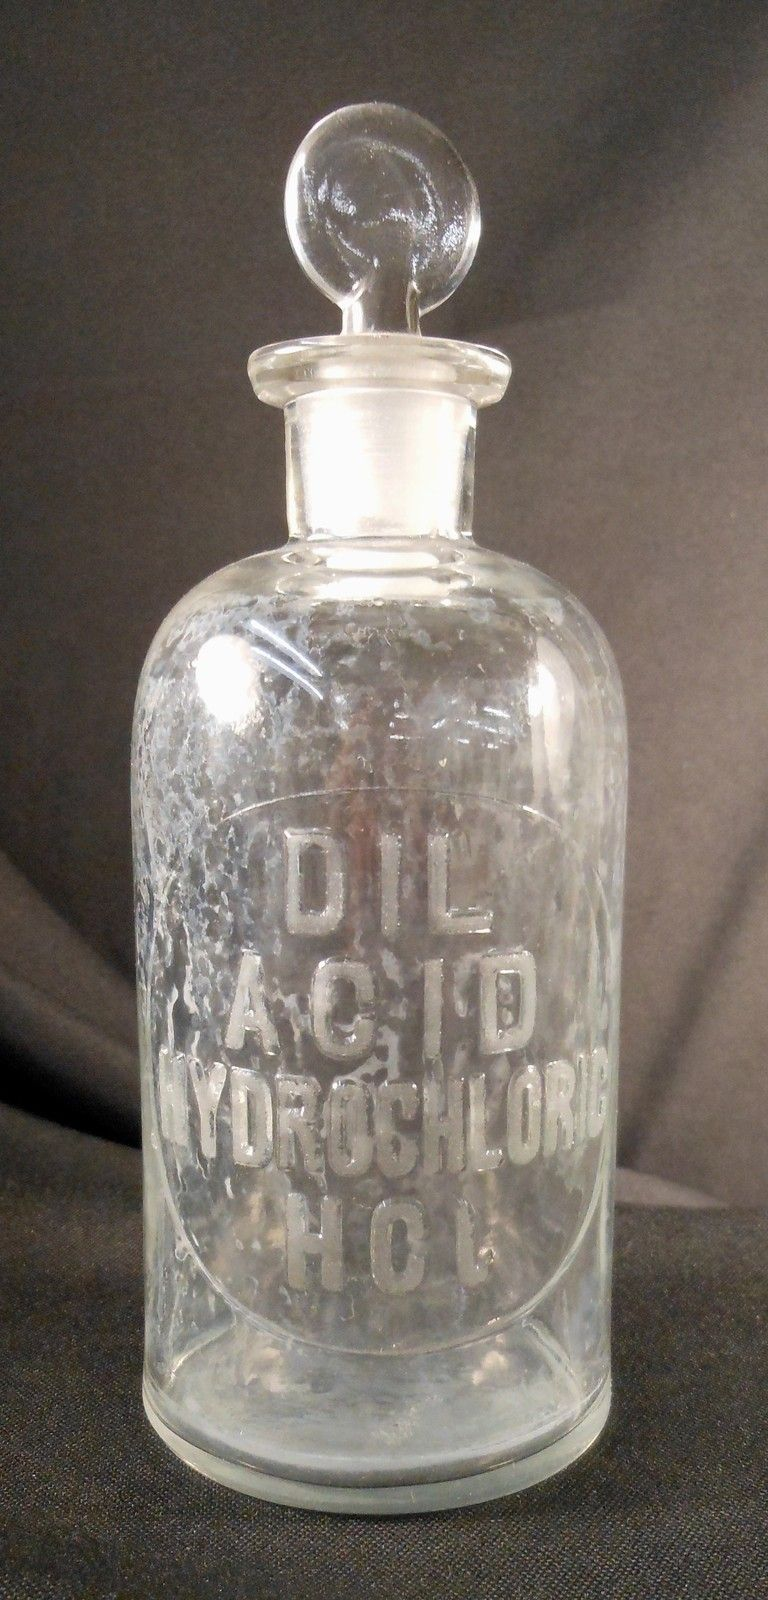 Vintage dil hydrochloric acid hcl glass chemical bottle for Retro glass bottles